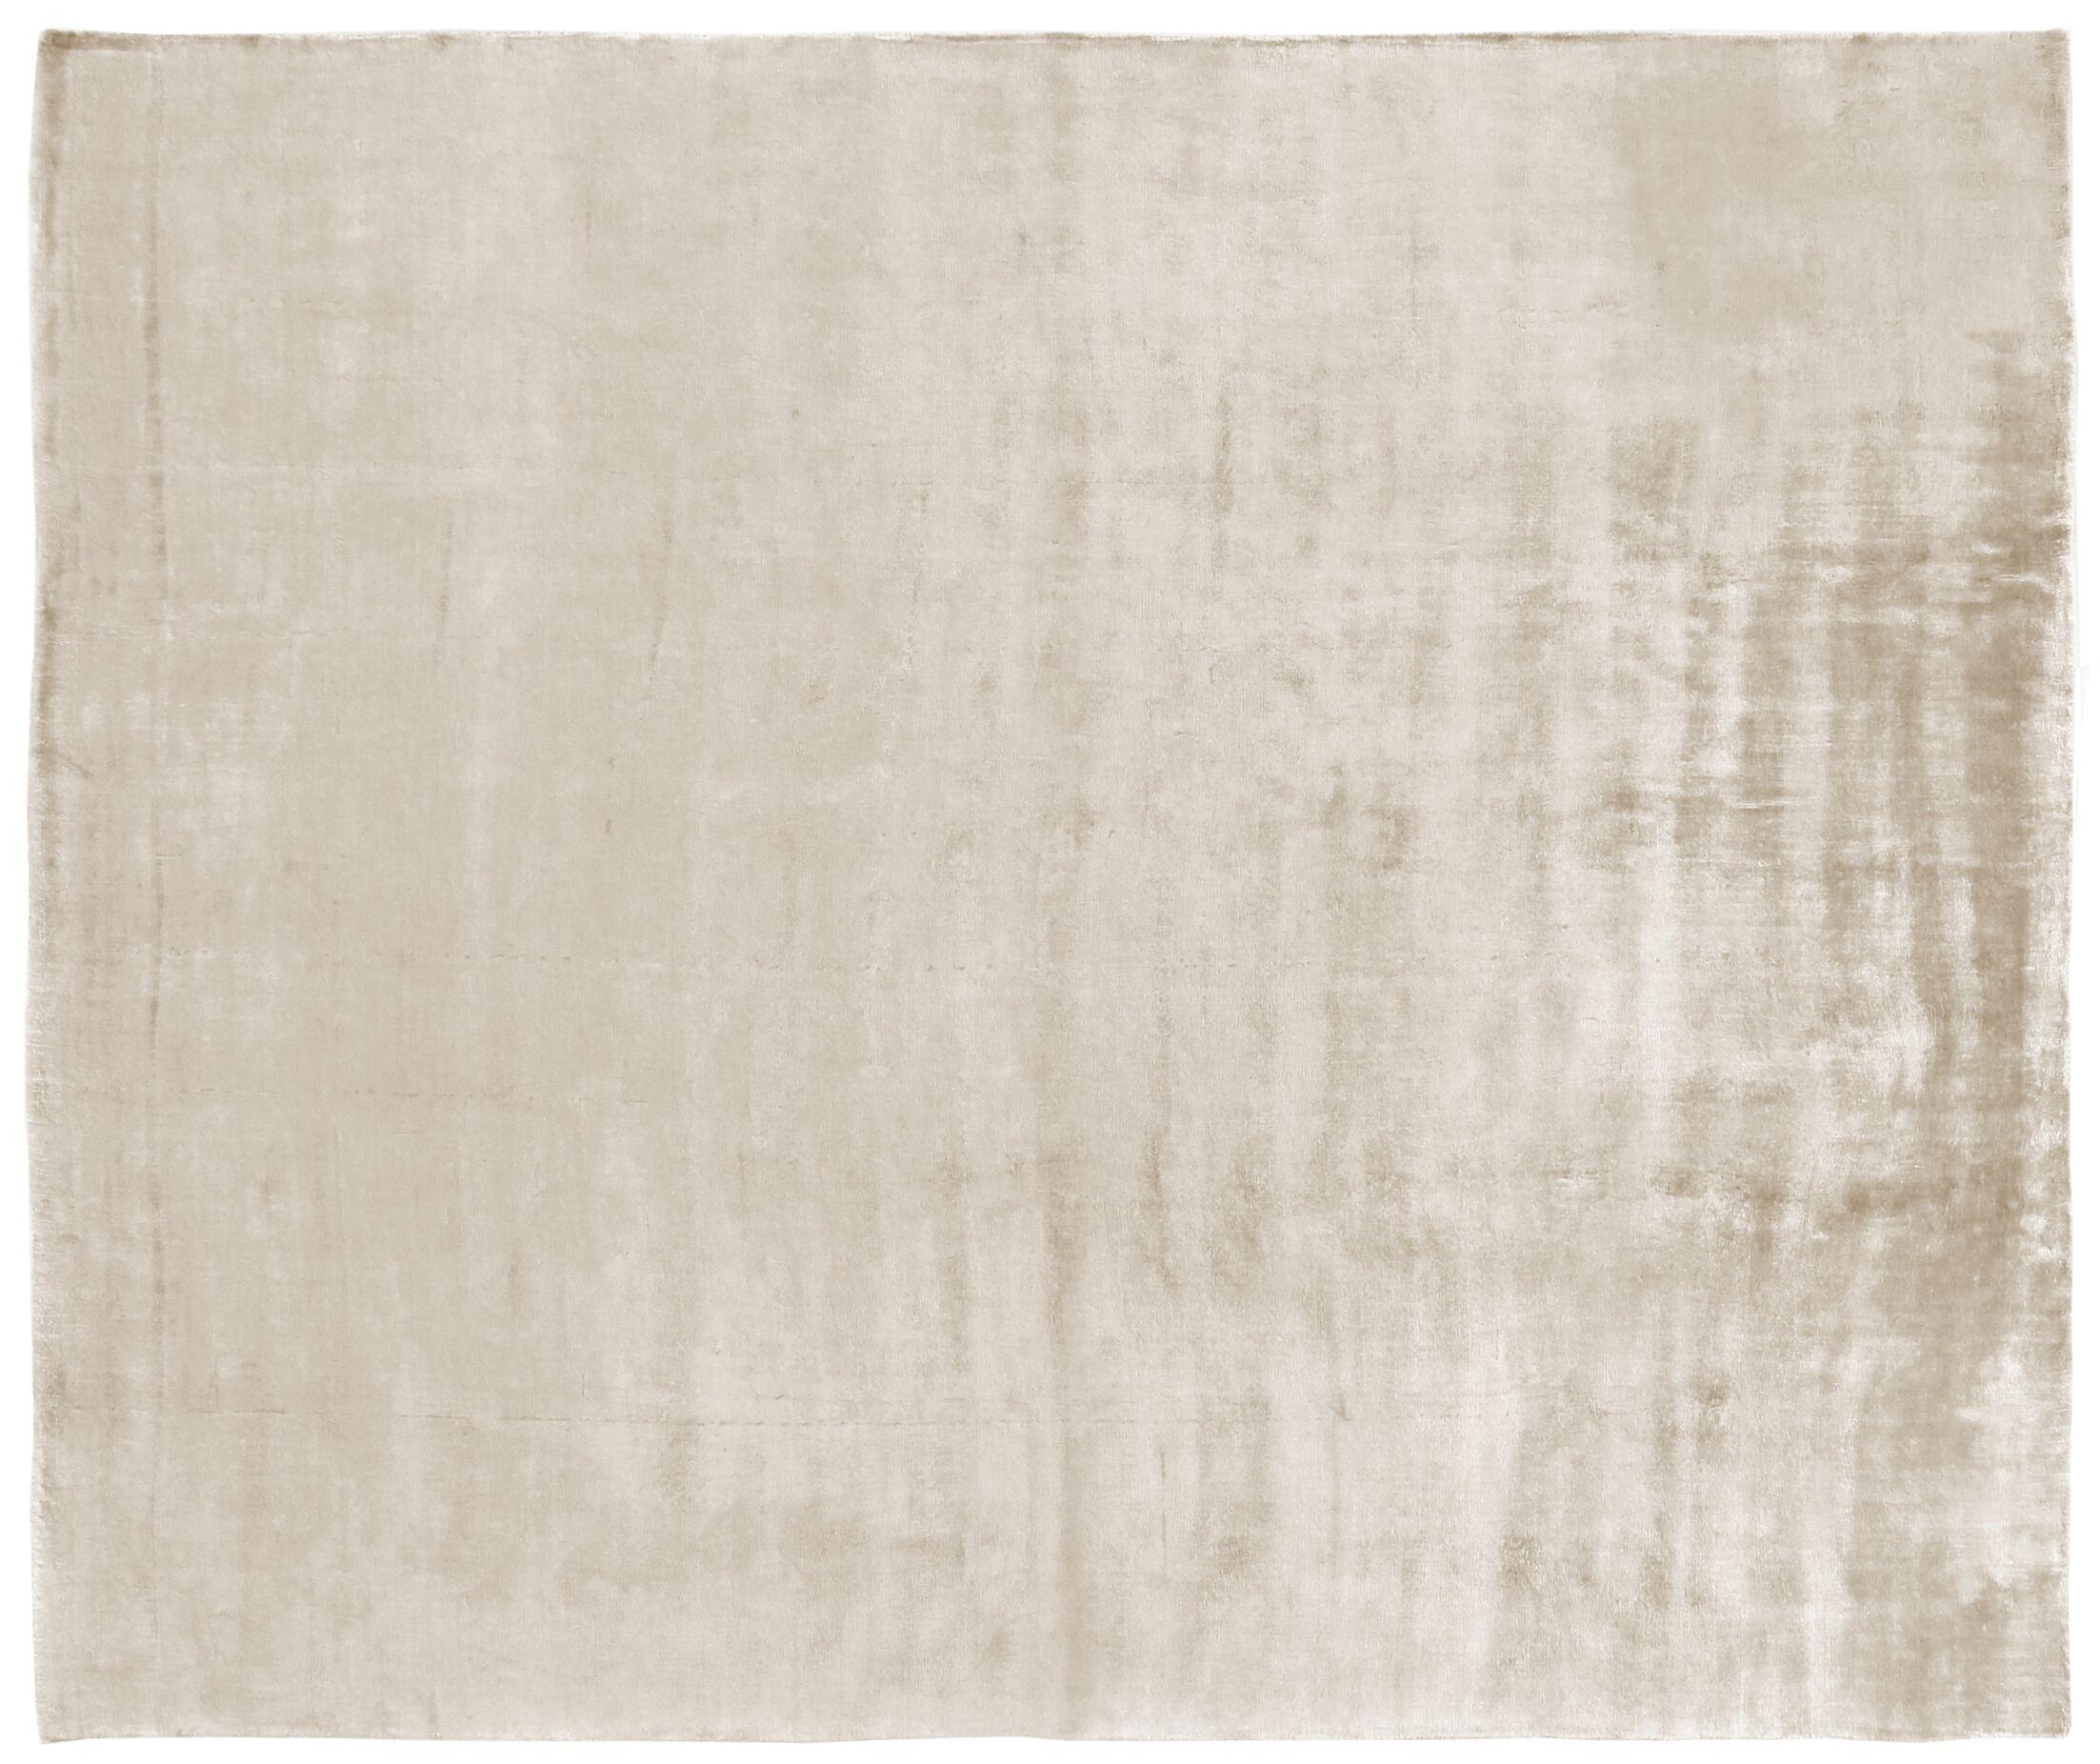 Purity Hand-Woven Ivory Area Rug Rug Size: Rectangle 14' x 18'